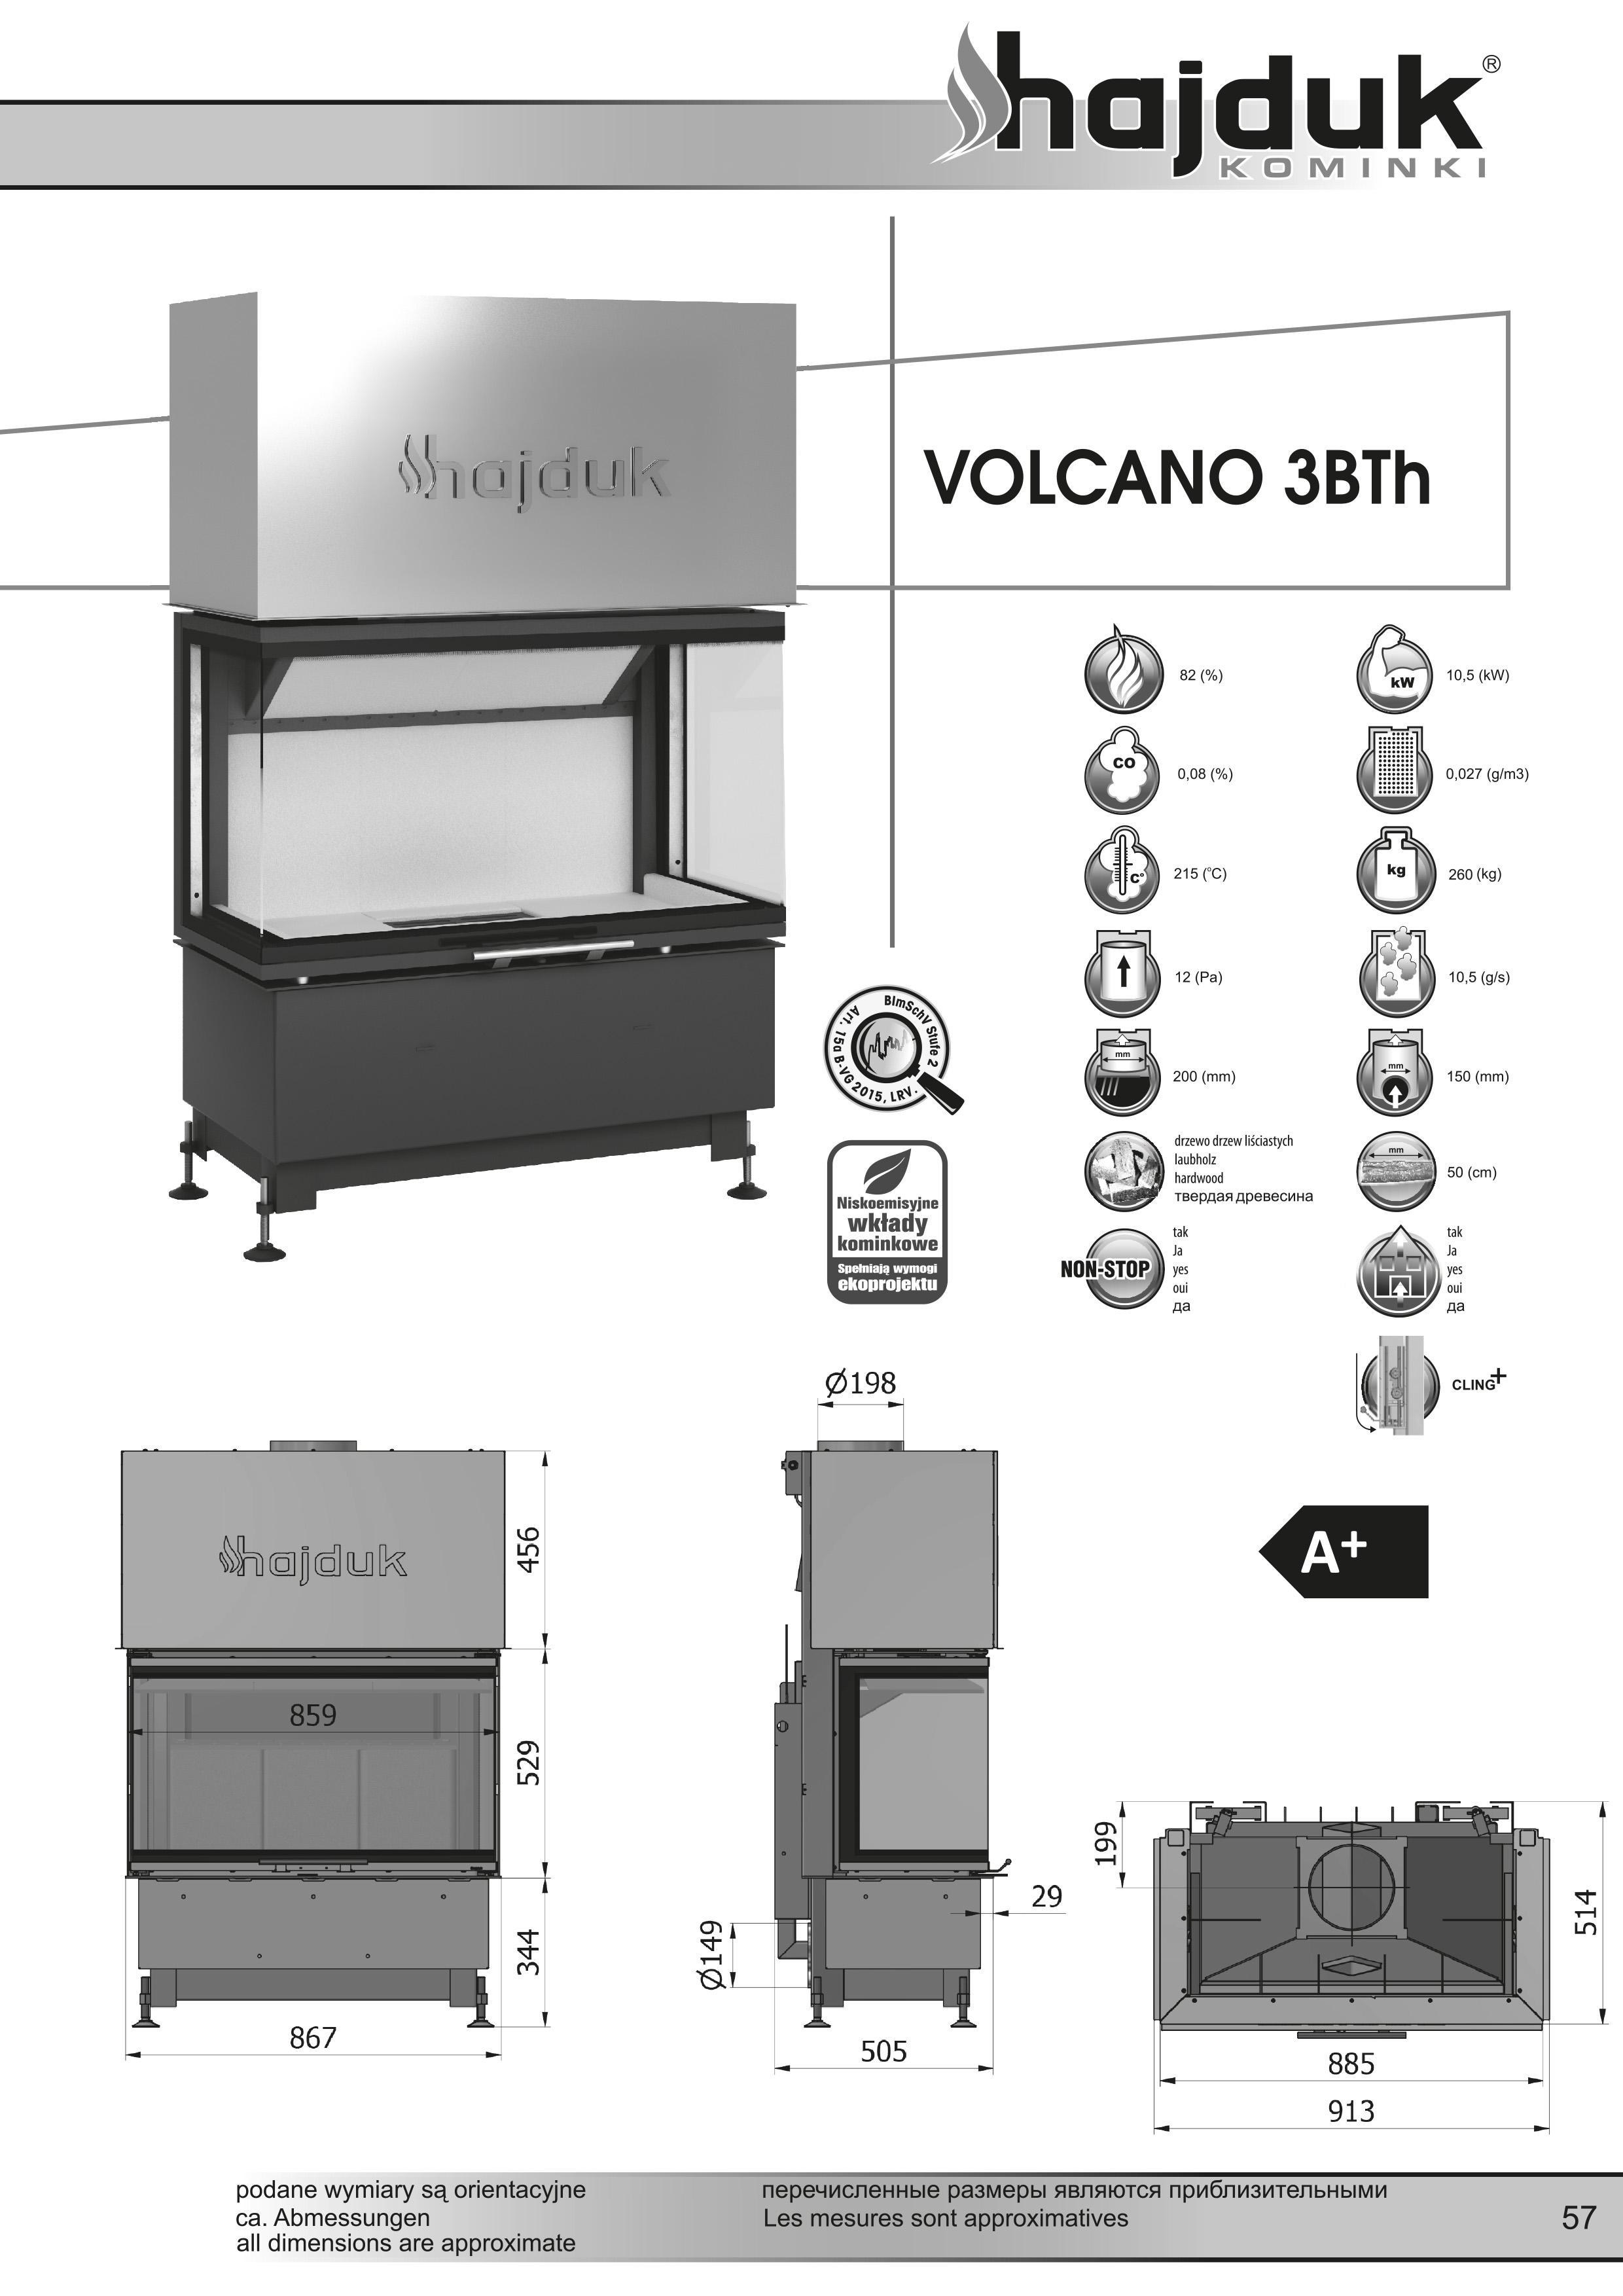 Volcano 3BTh